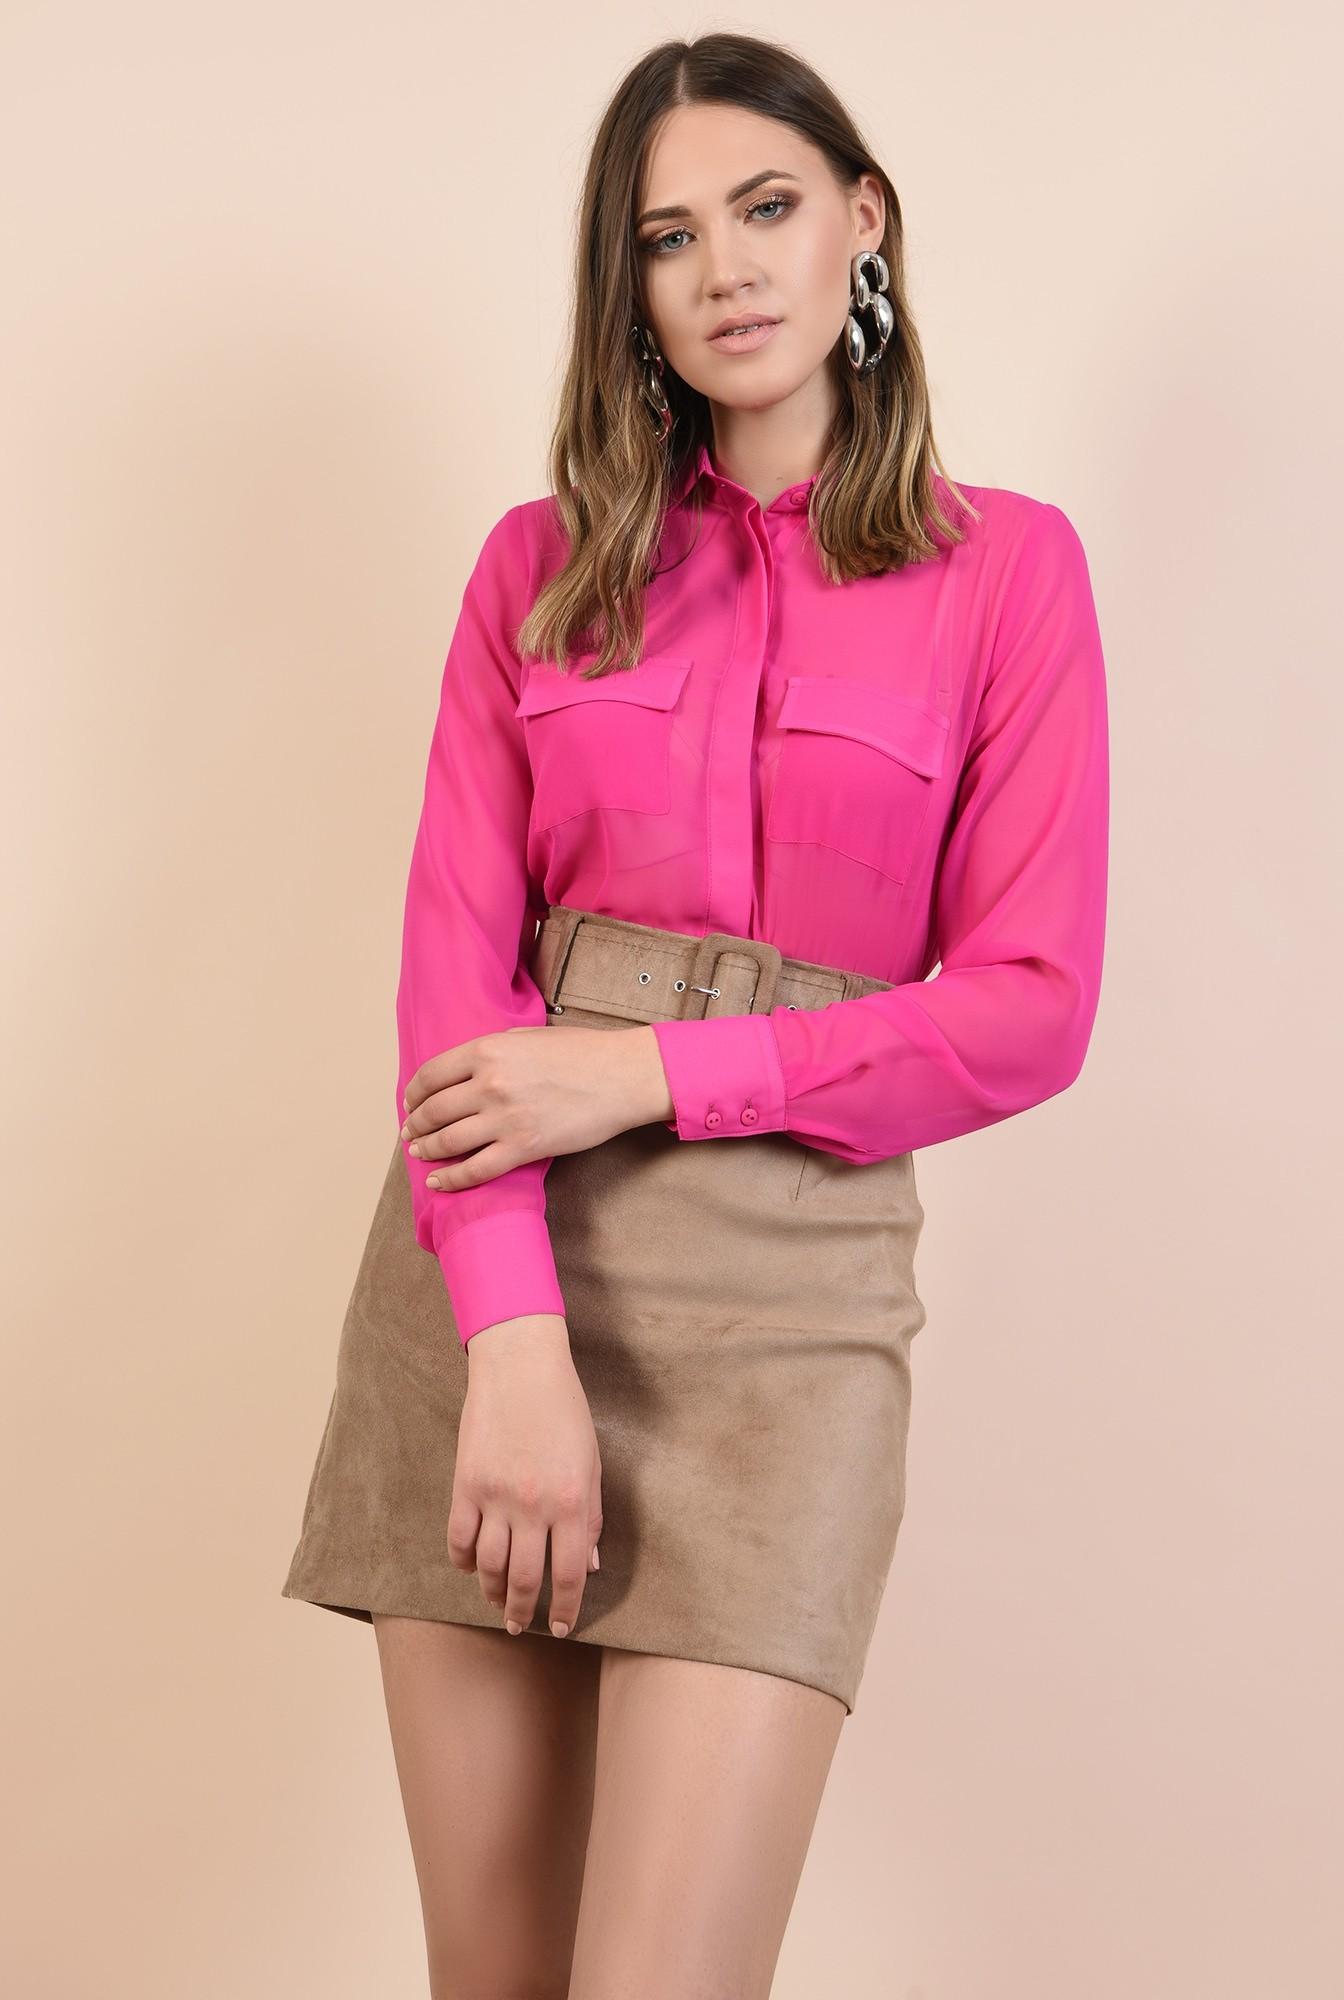 0 - camasa roz, cu buzunare la piept, maneci lungi, guler ascutit, nasturi